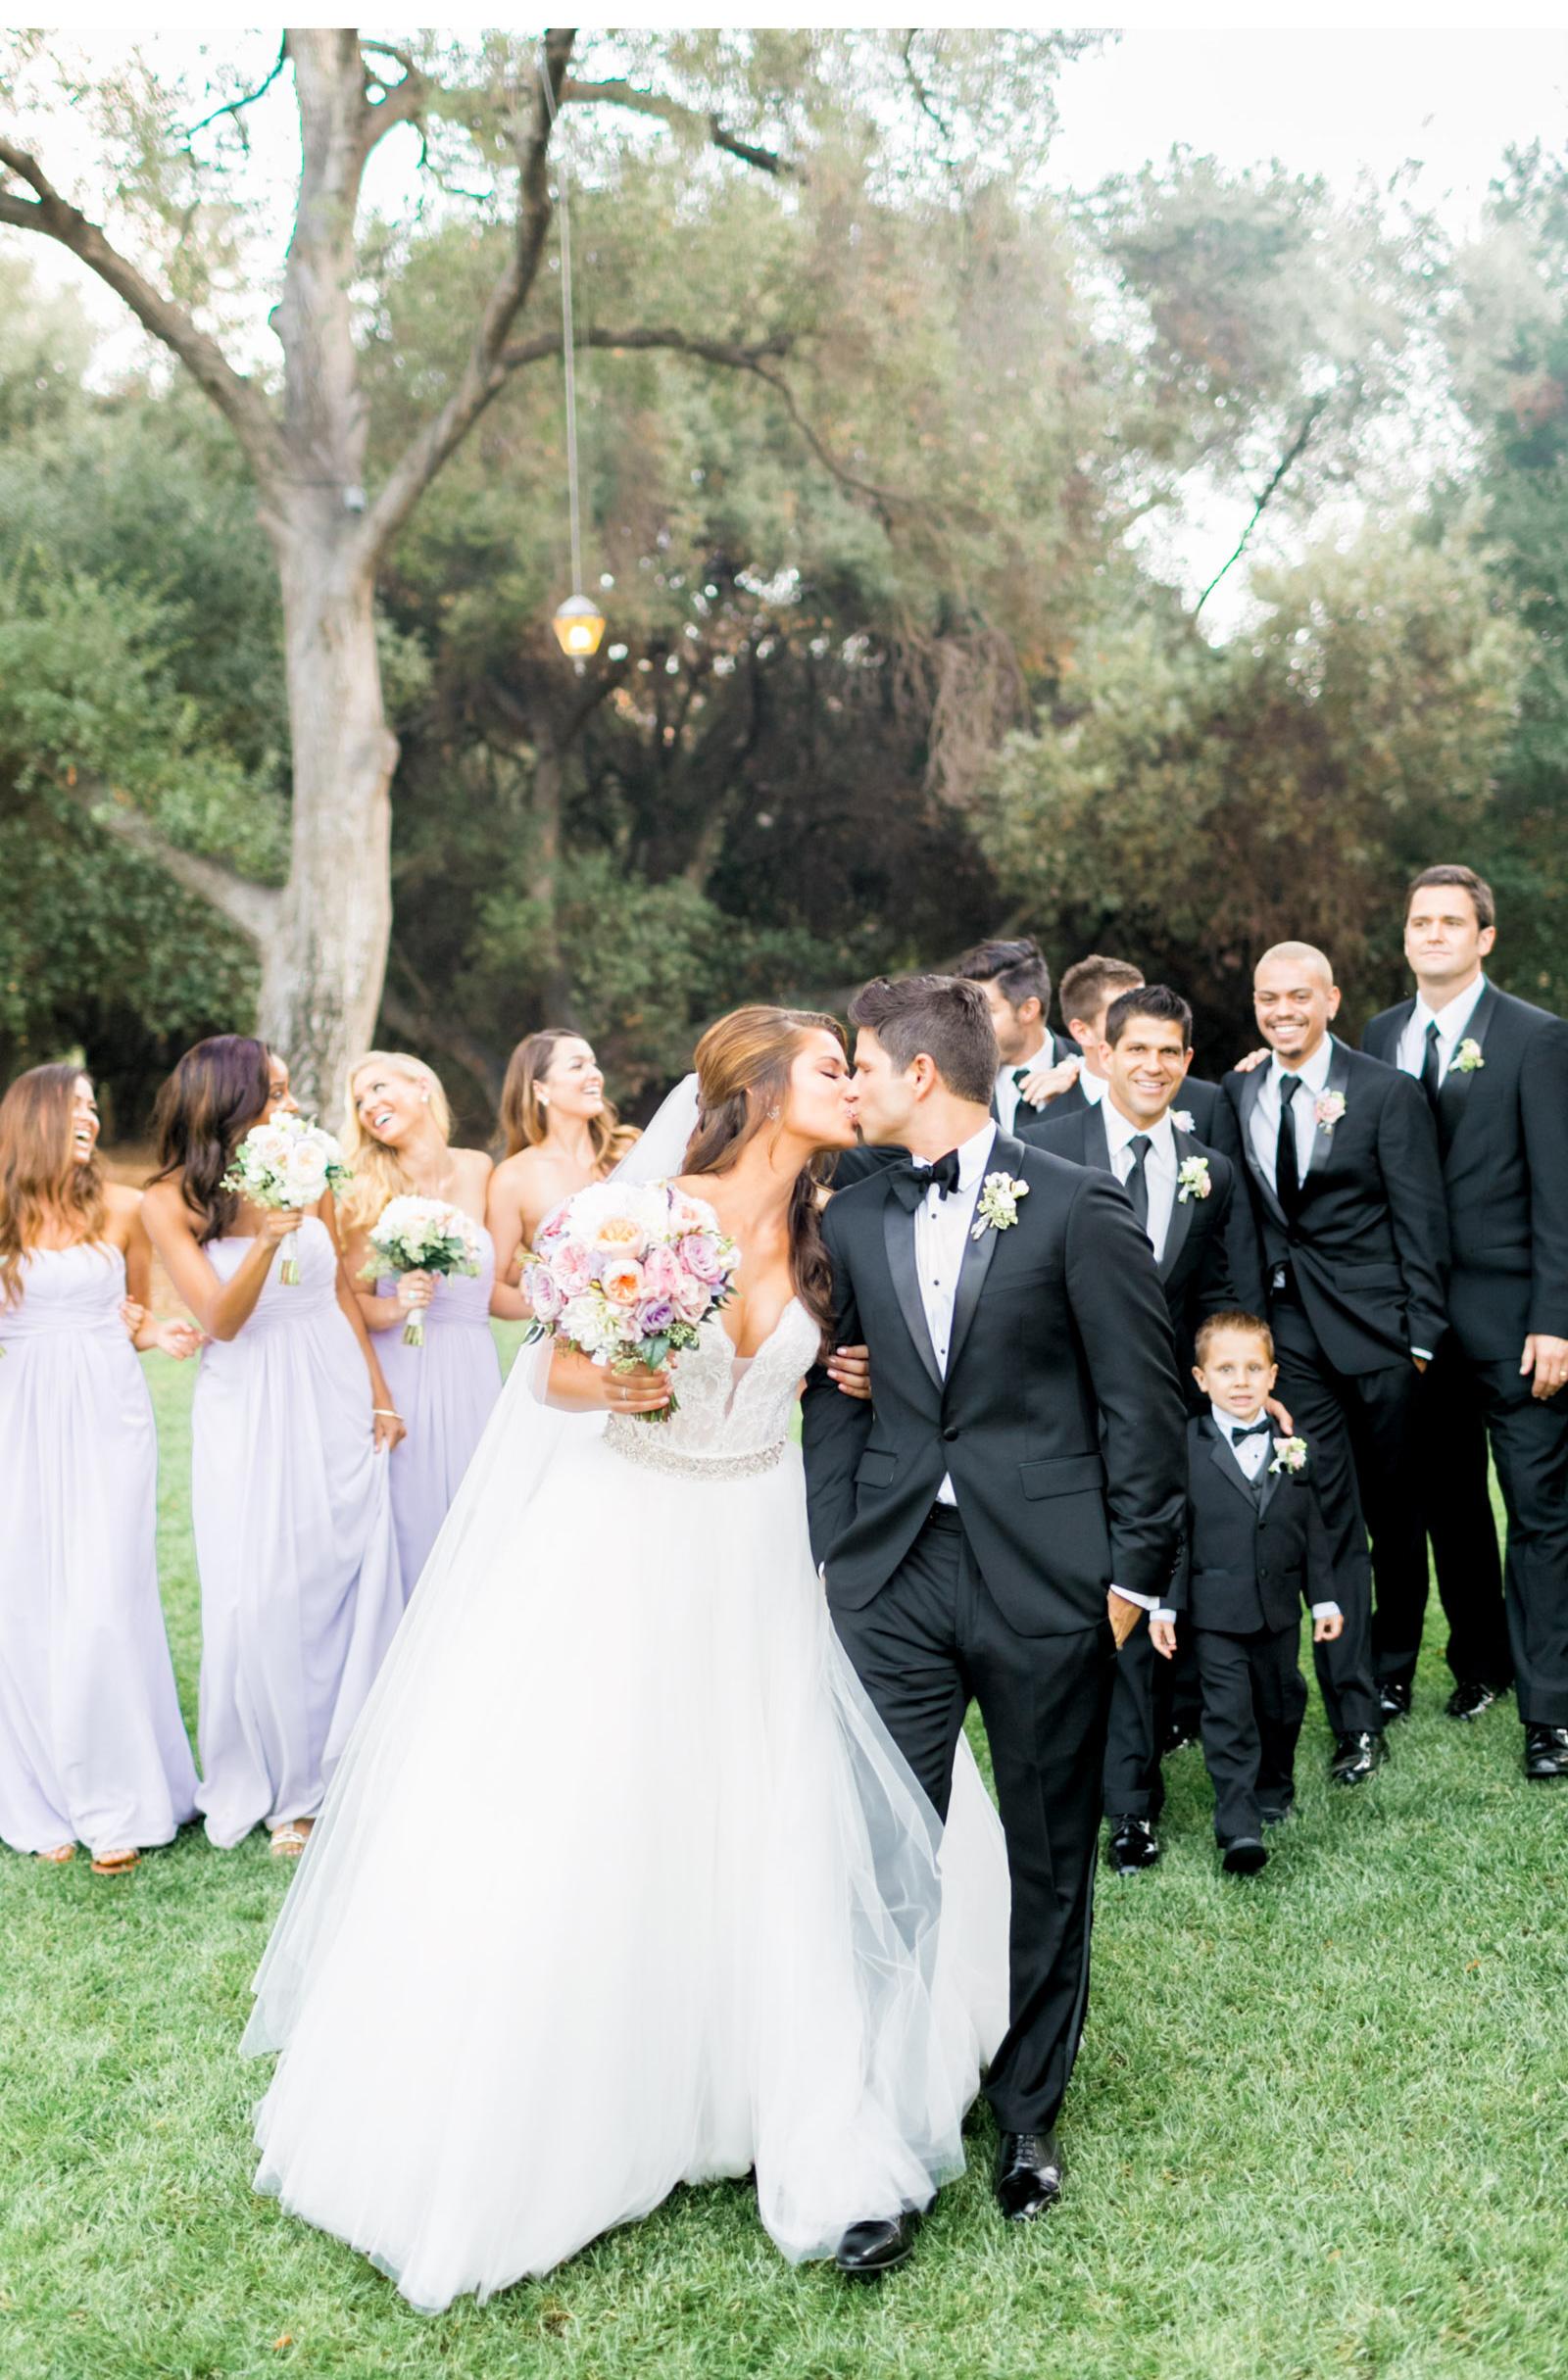 Daniel-&-Nia-Sanchez-Miss-USA-Wedding-Natalie-Schutt-Photography_03.jpg